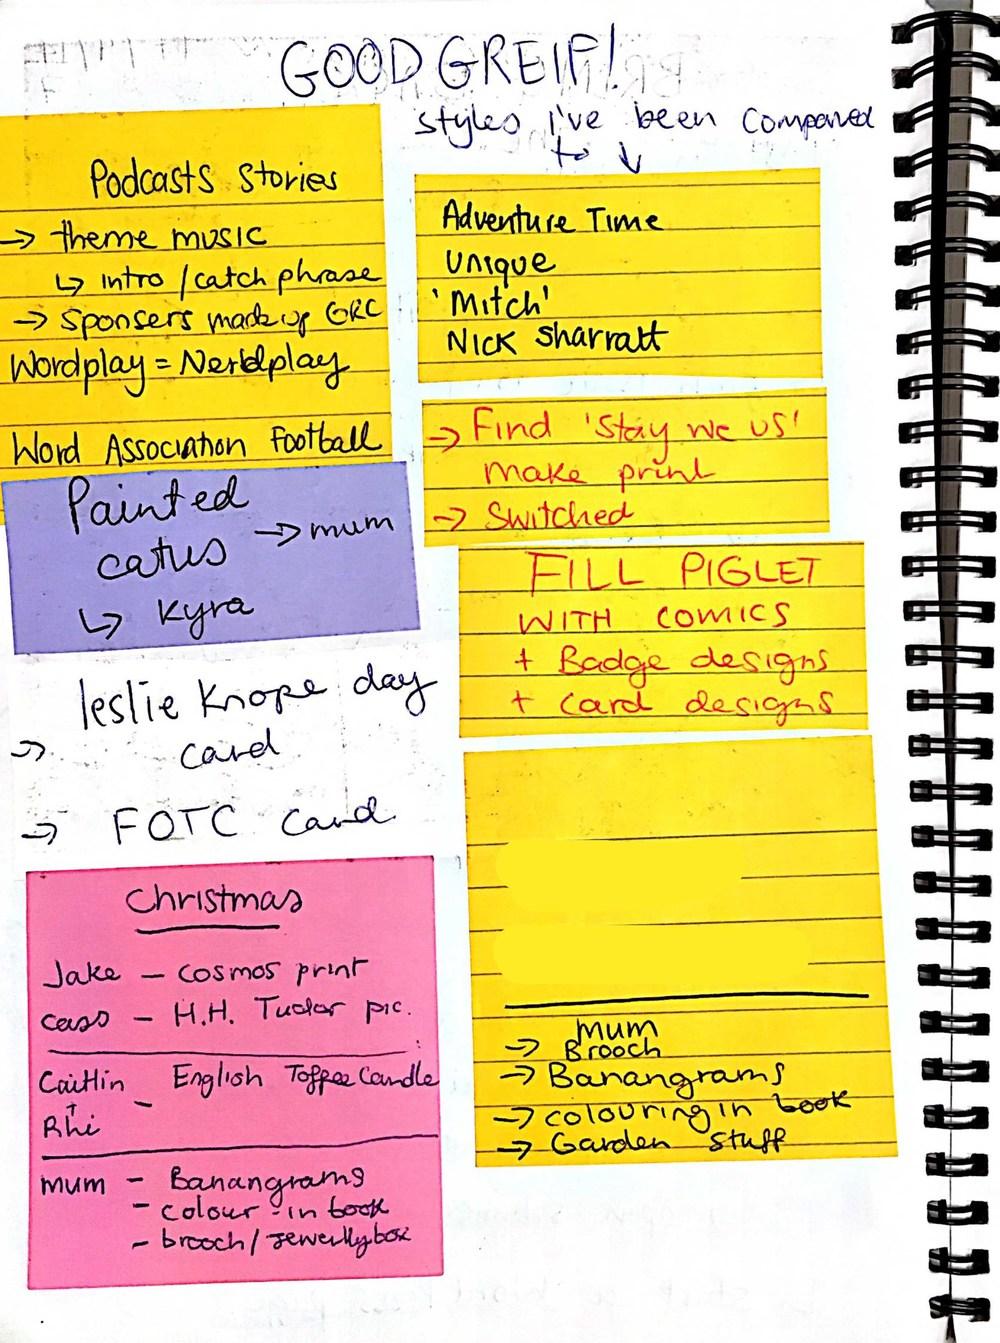 Post it notes 2.jpg